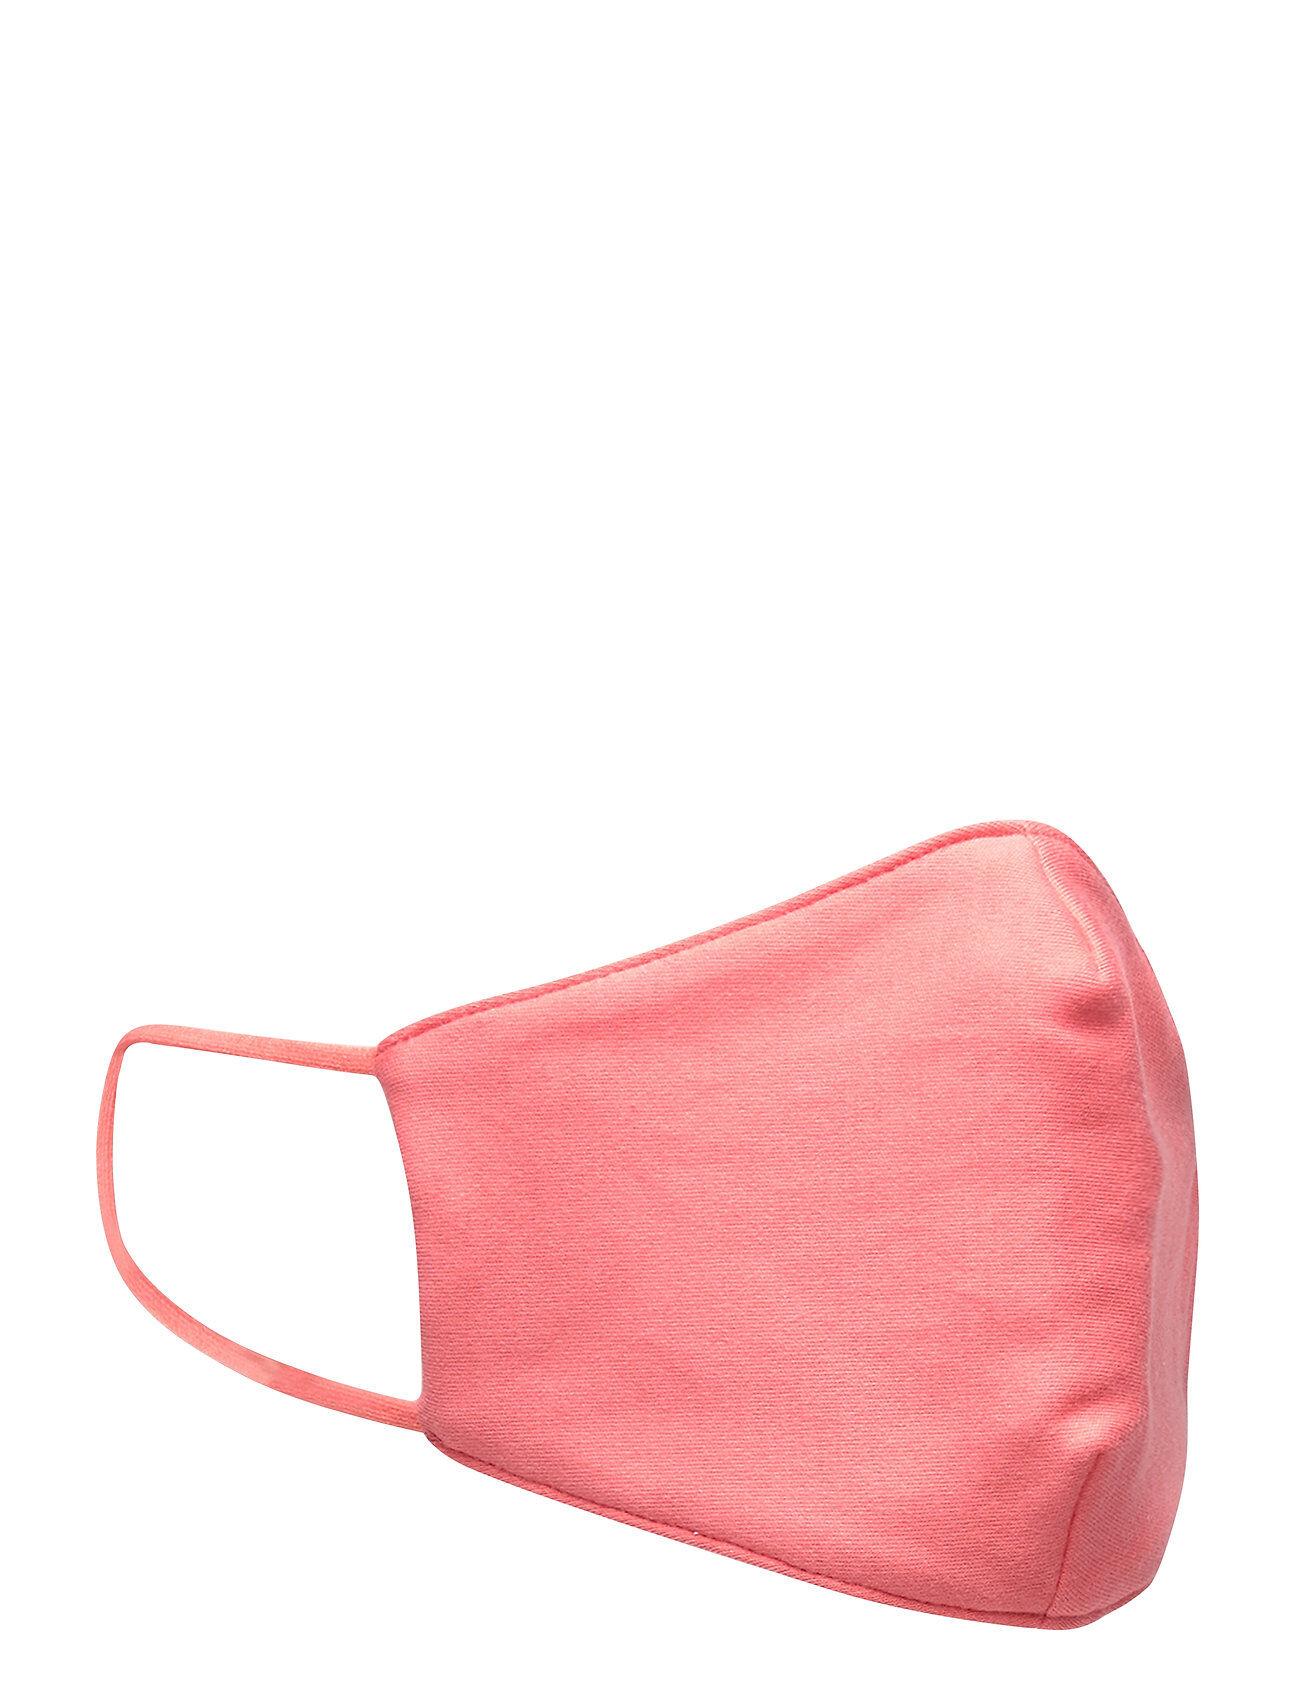 Tom Tailor Community Fa Accessories Face Masks Vaaleanpunainen Tom Tailor